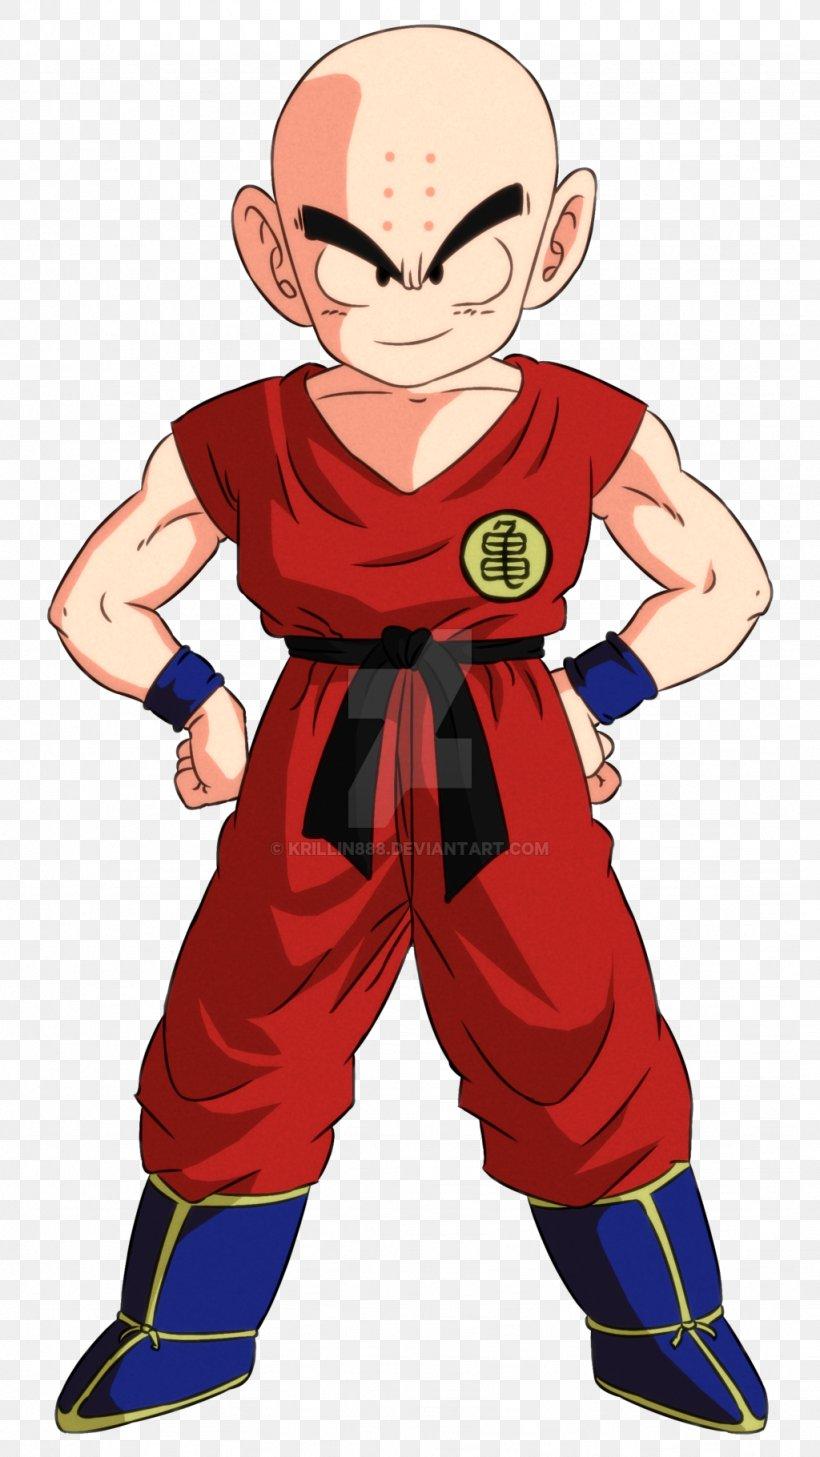 Krillin Goku Piccolo Vegeta Gohan, PNG, 1024x1820px, Krillin, Arm, Art, Boy, Cartoon Download Free